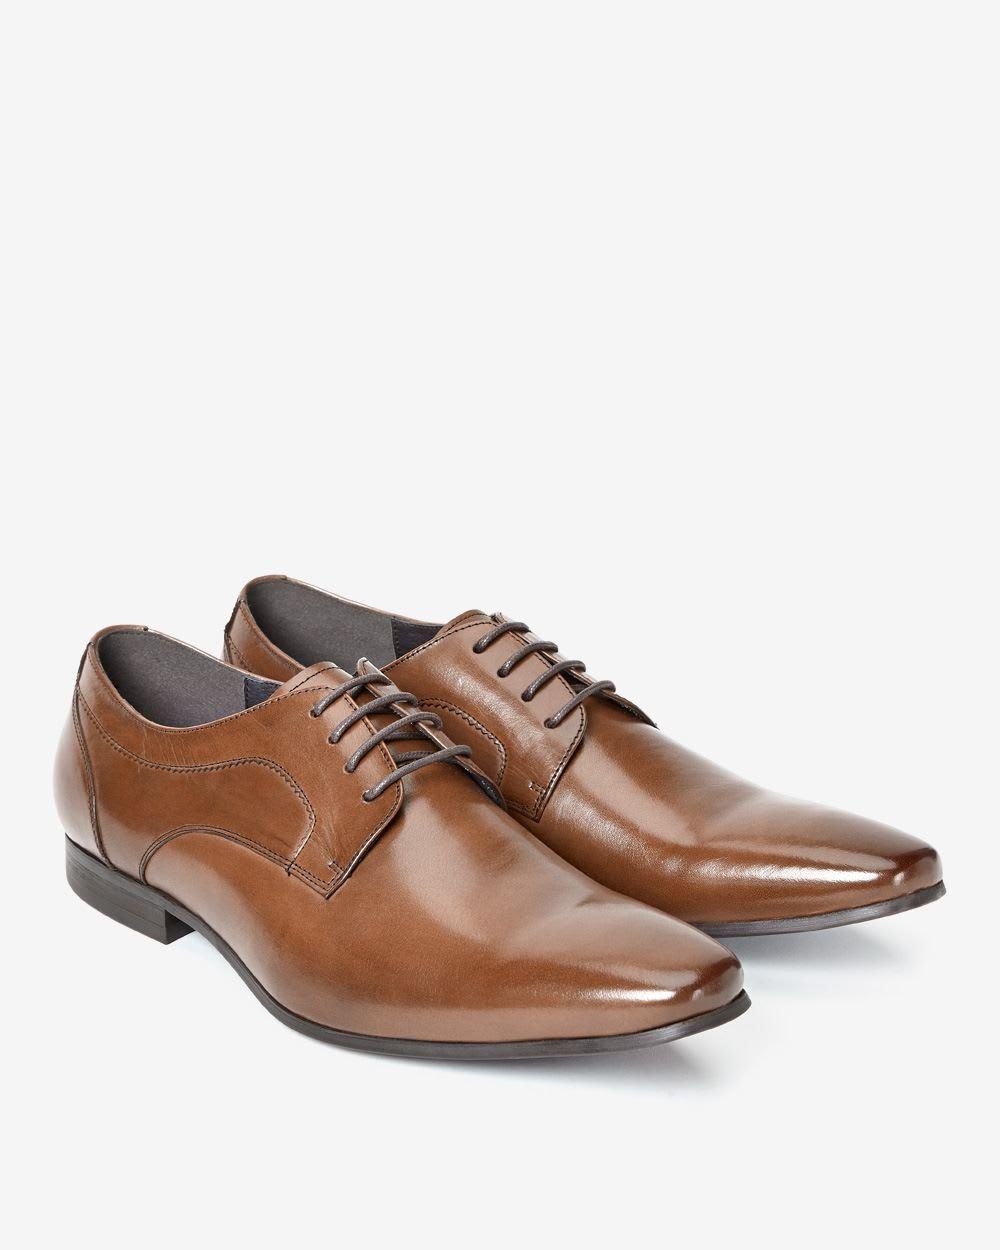 Chaussures - Bas-tops Et Baskets Signatura rE5yPe